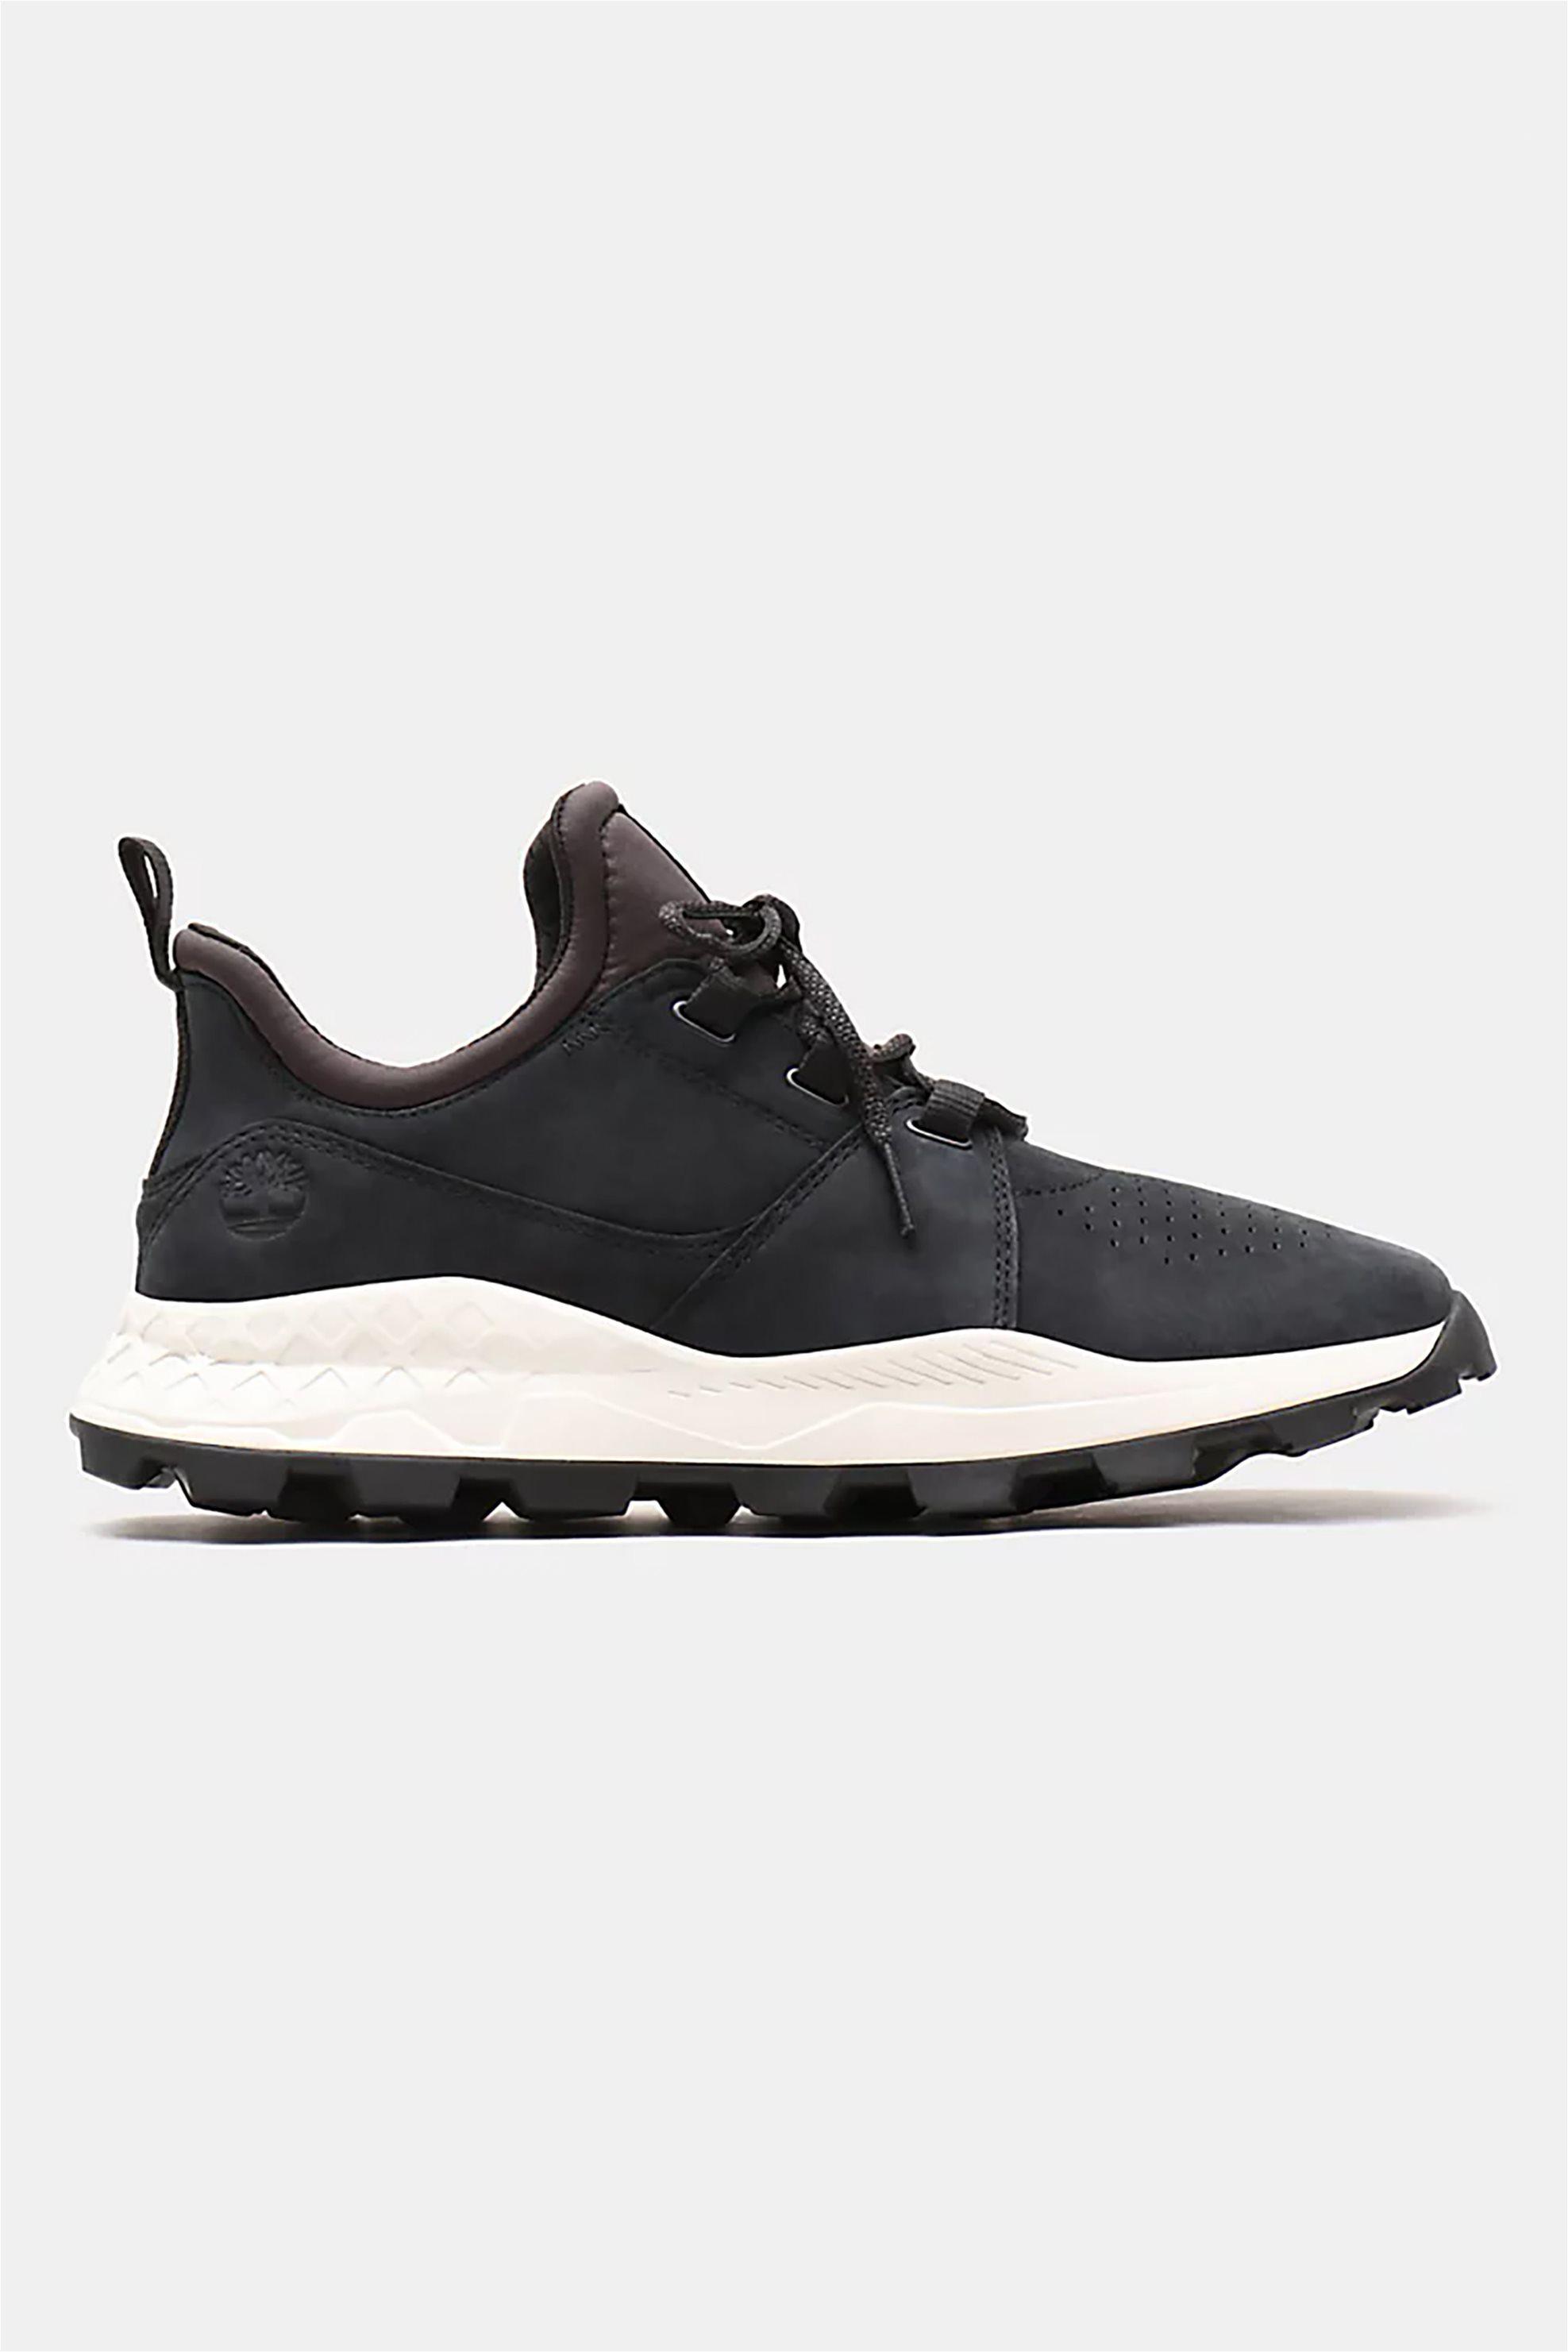 Timberland ανδρικά sneakers με κορδόνια «Brooklyn Oxford» – TB0A2BBT0011 – Μαύρο